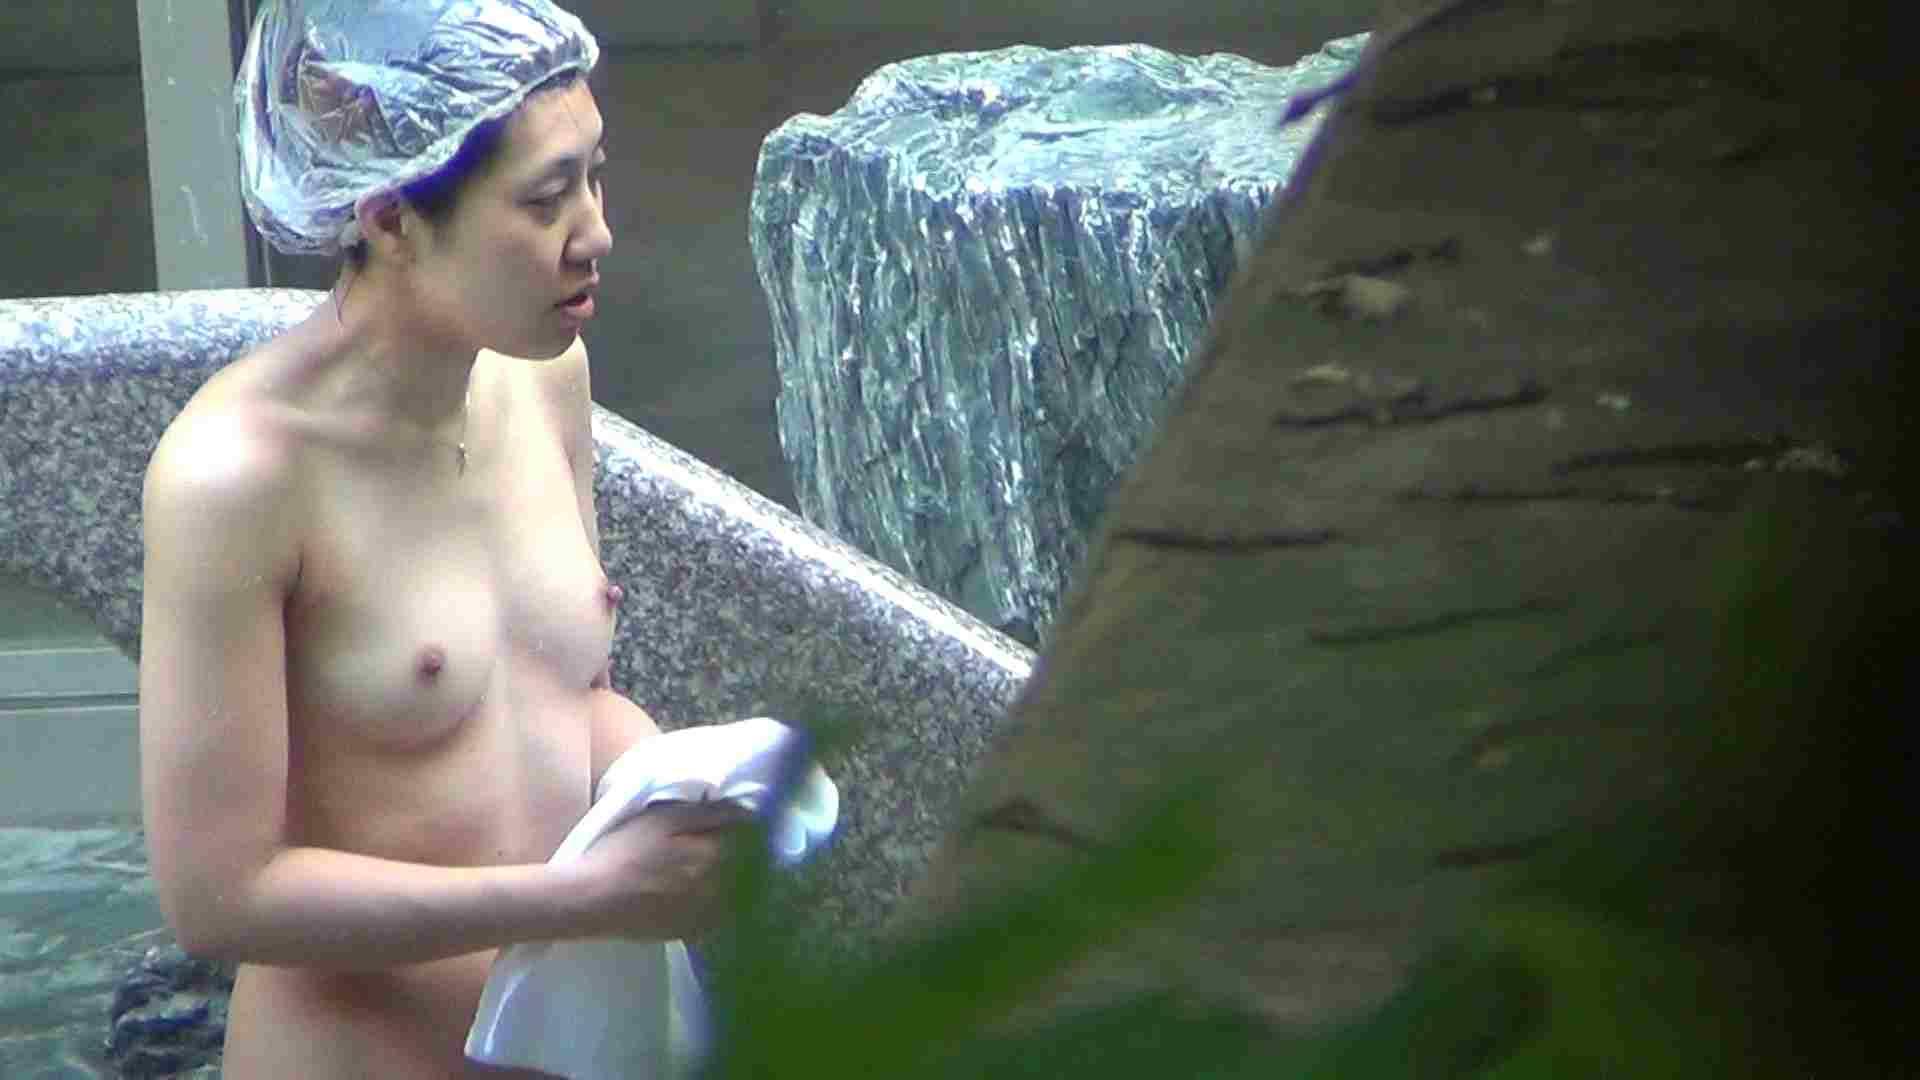 Aquaな露天風呂Vol.255 HなOL オメコ無修正動画無料 108pic 30